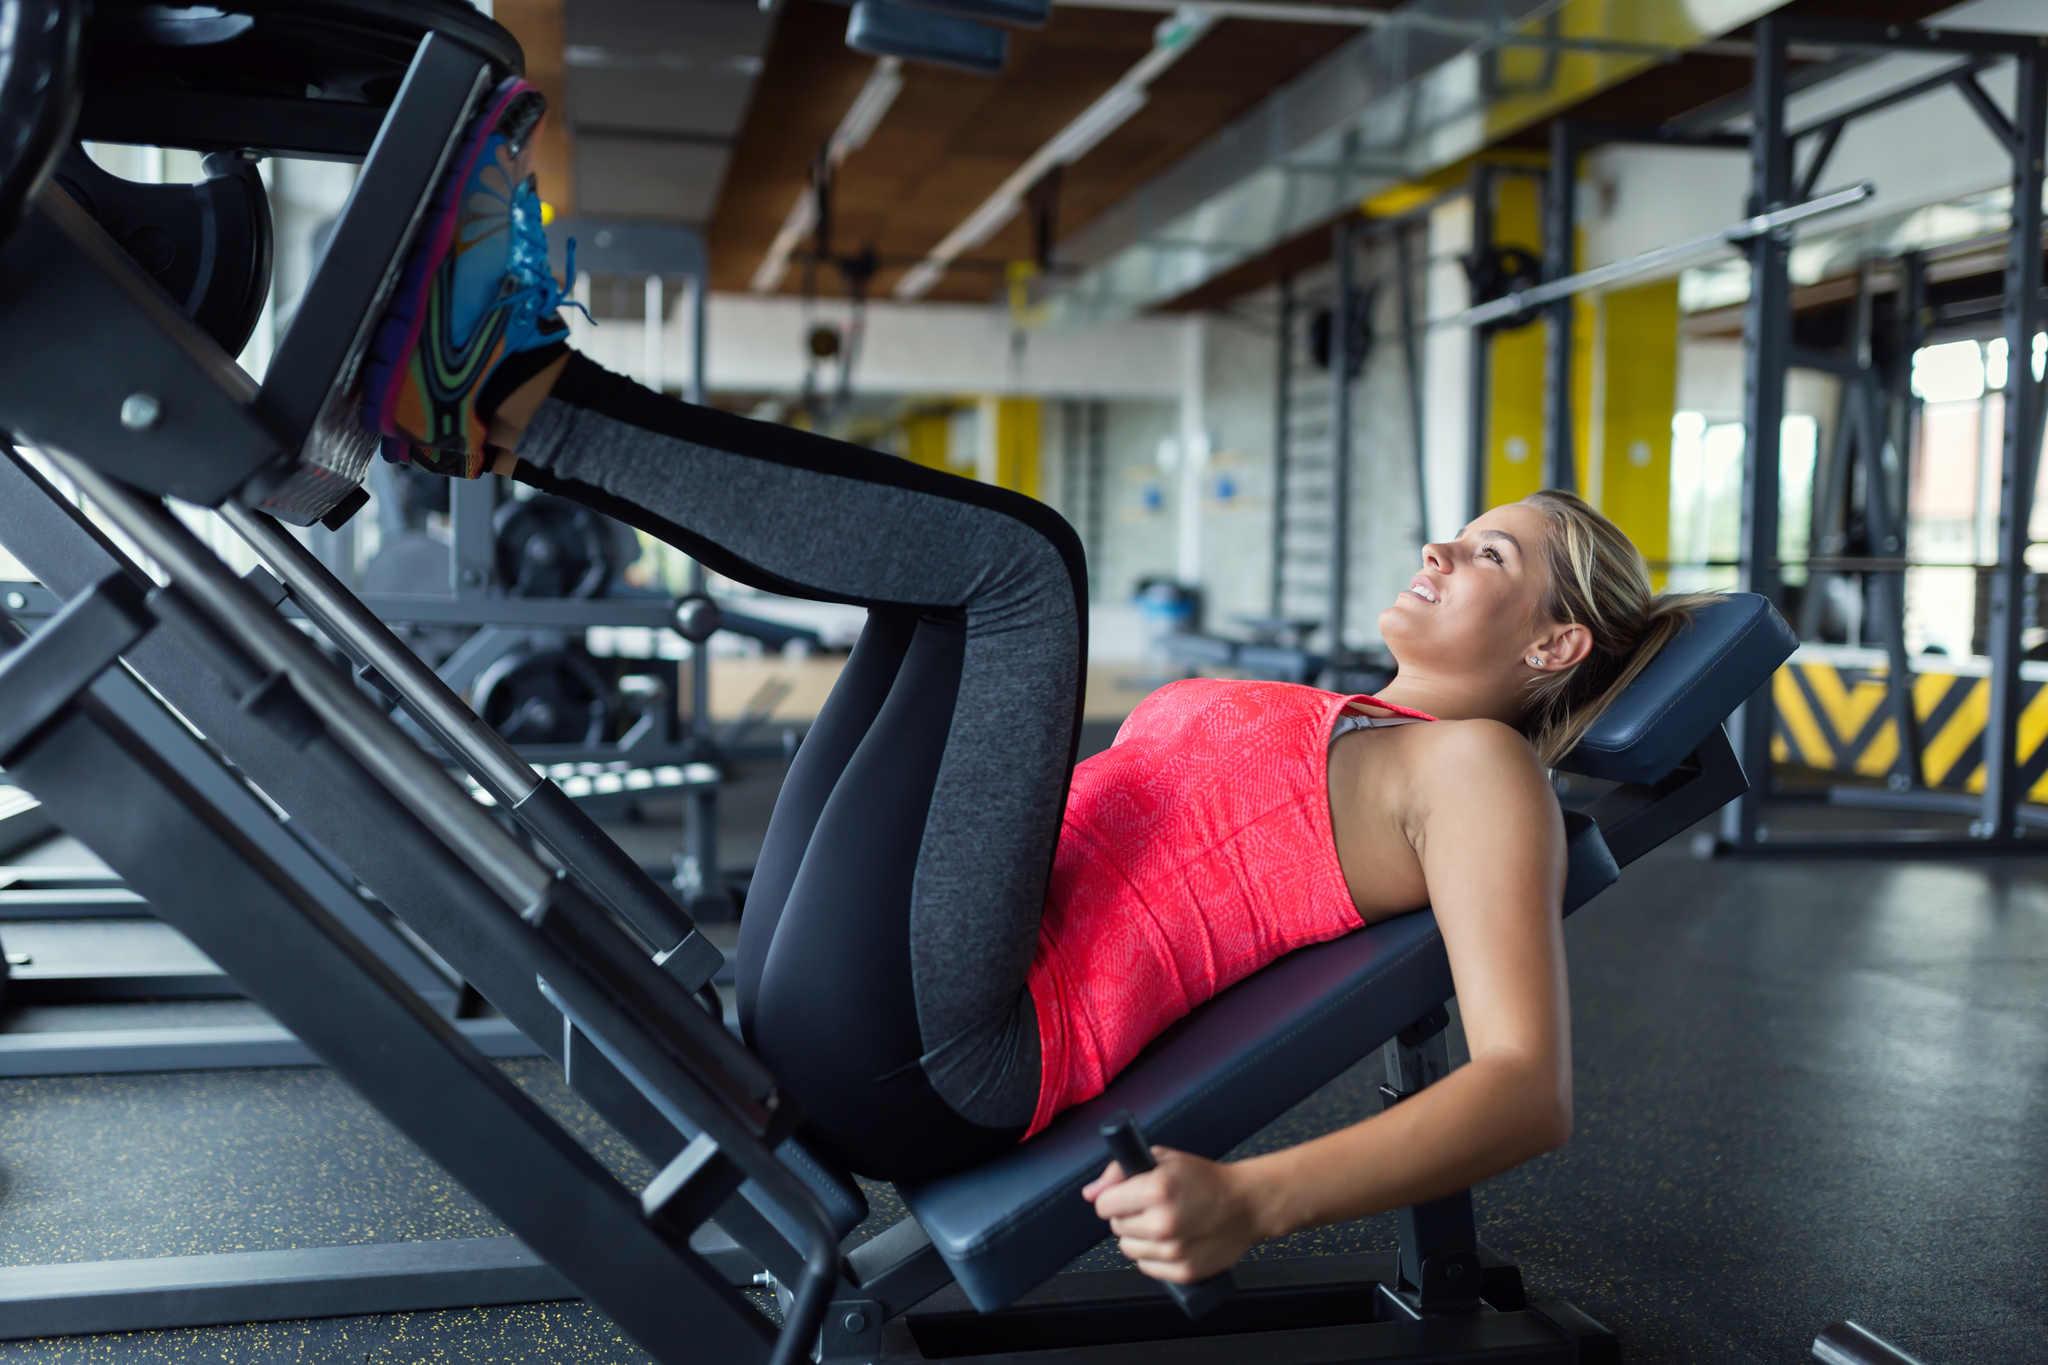 bacak egzersizi, kireçlenme tedavisi